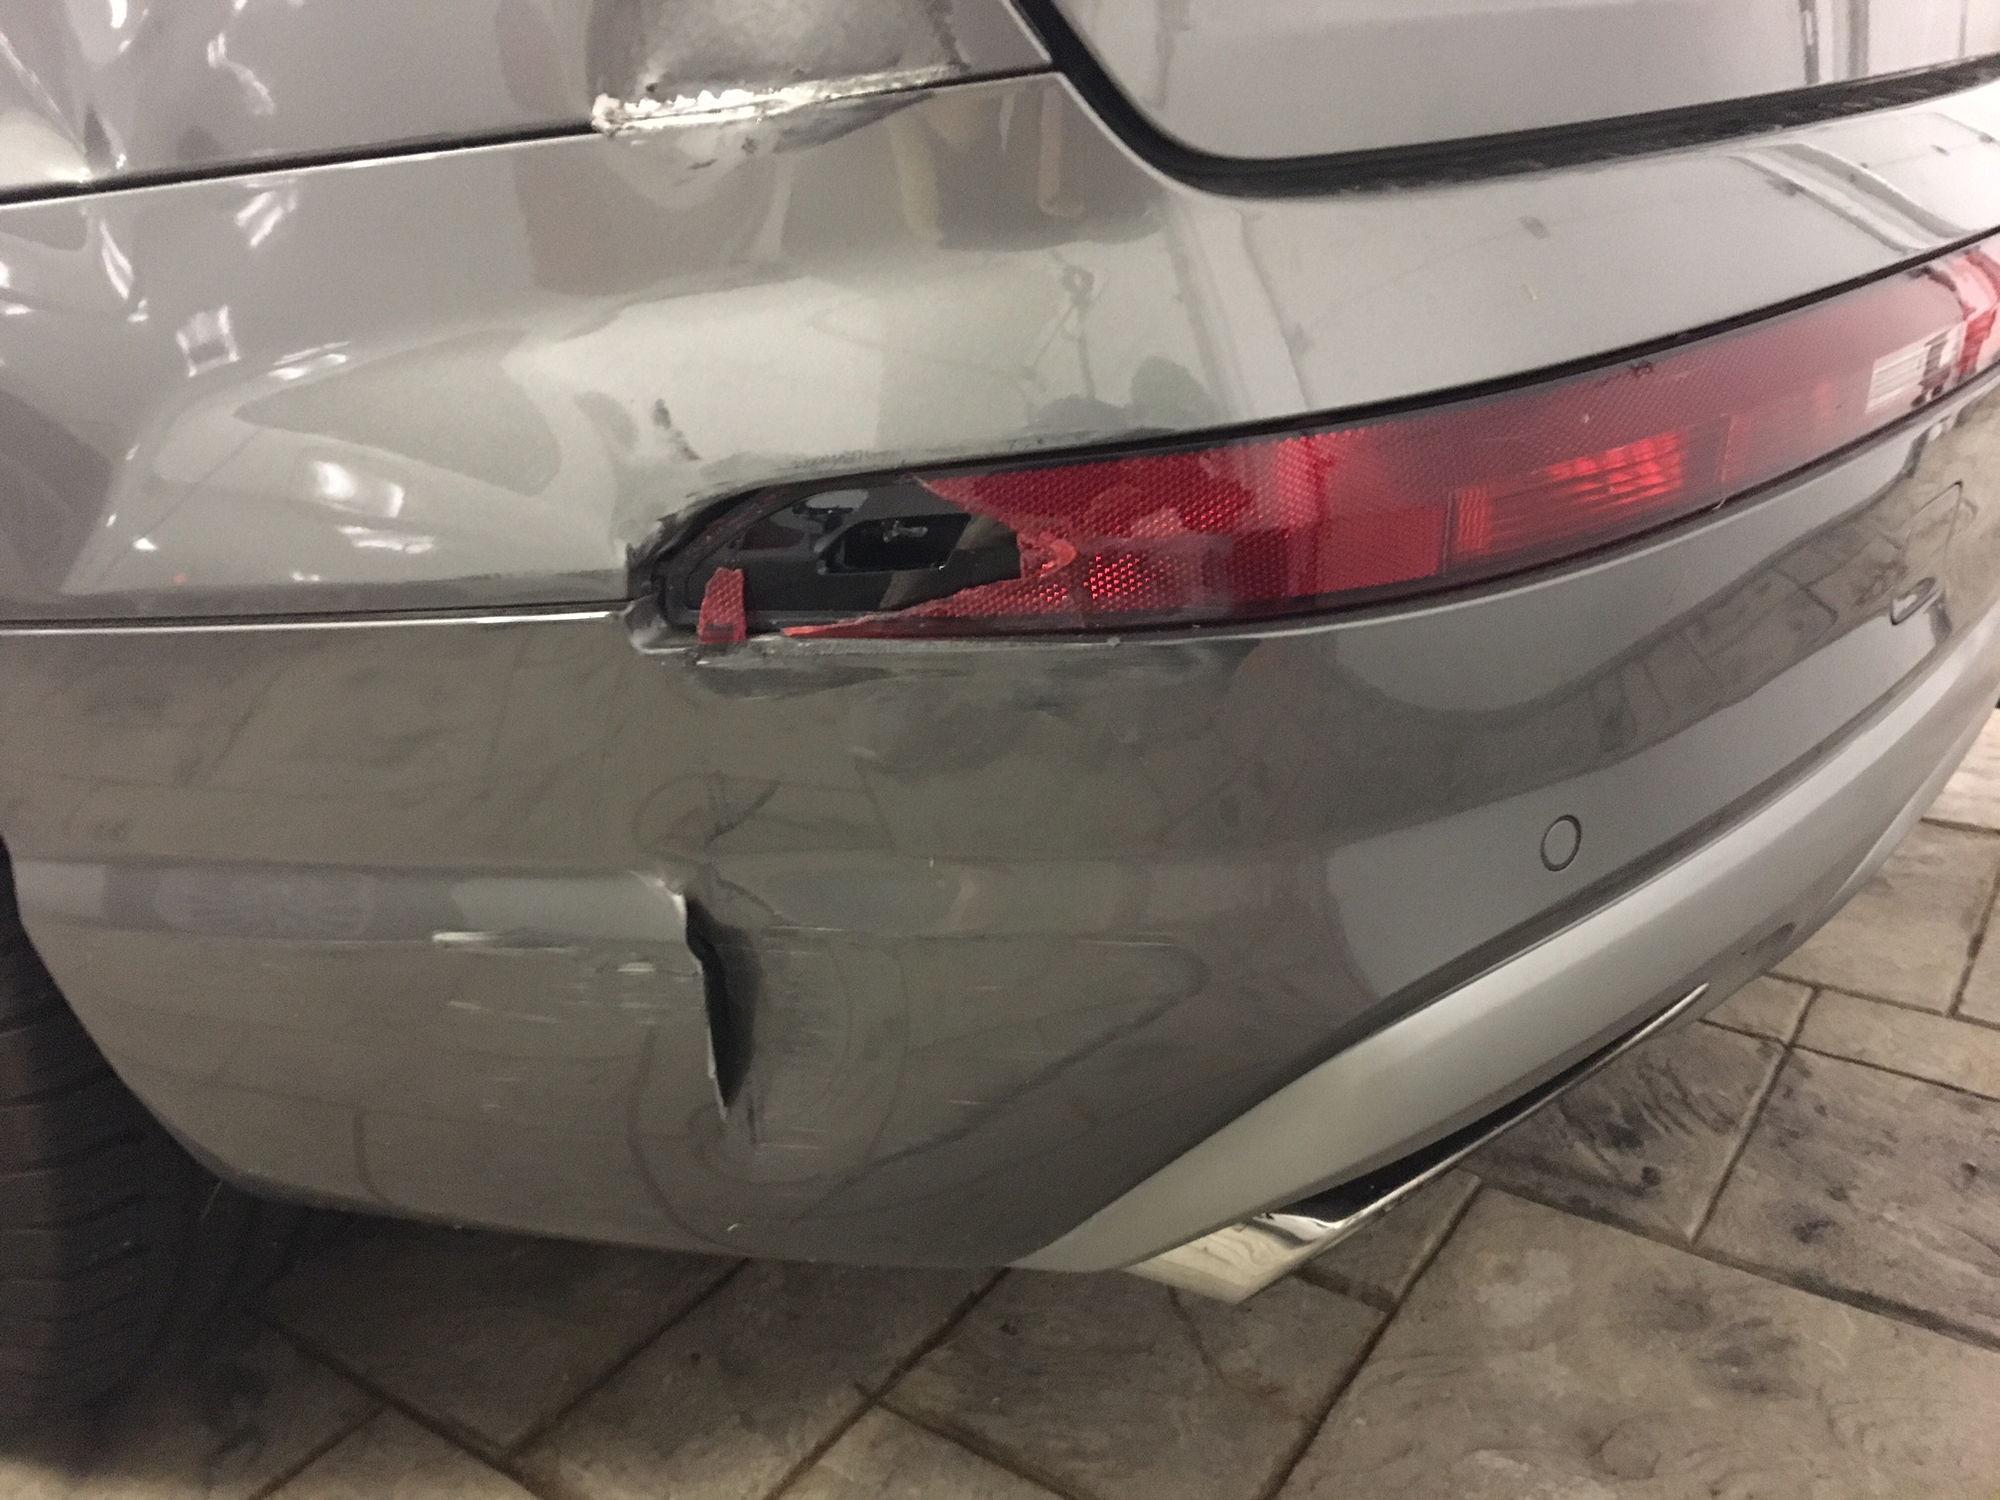 Repair Estimate - rear bumper covers and left quarter panel - AudiWorld Forums